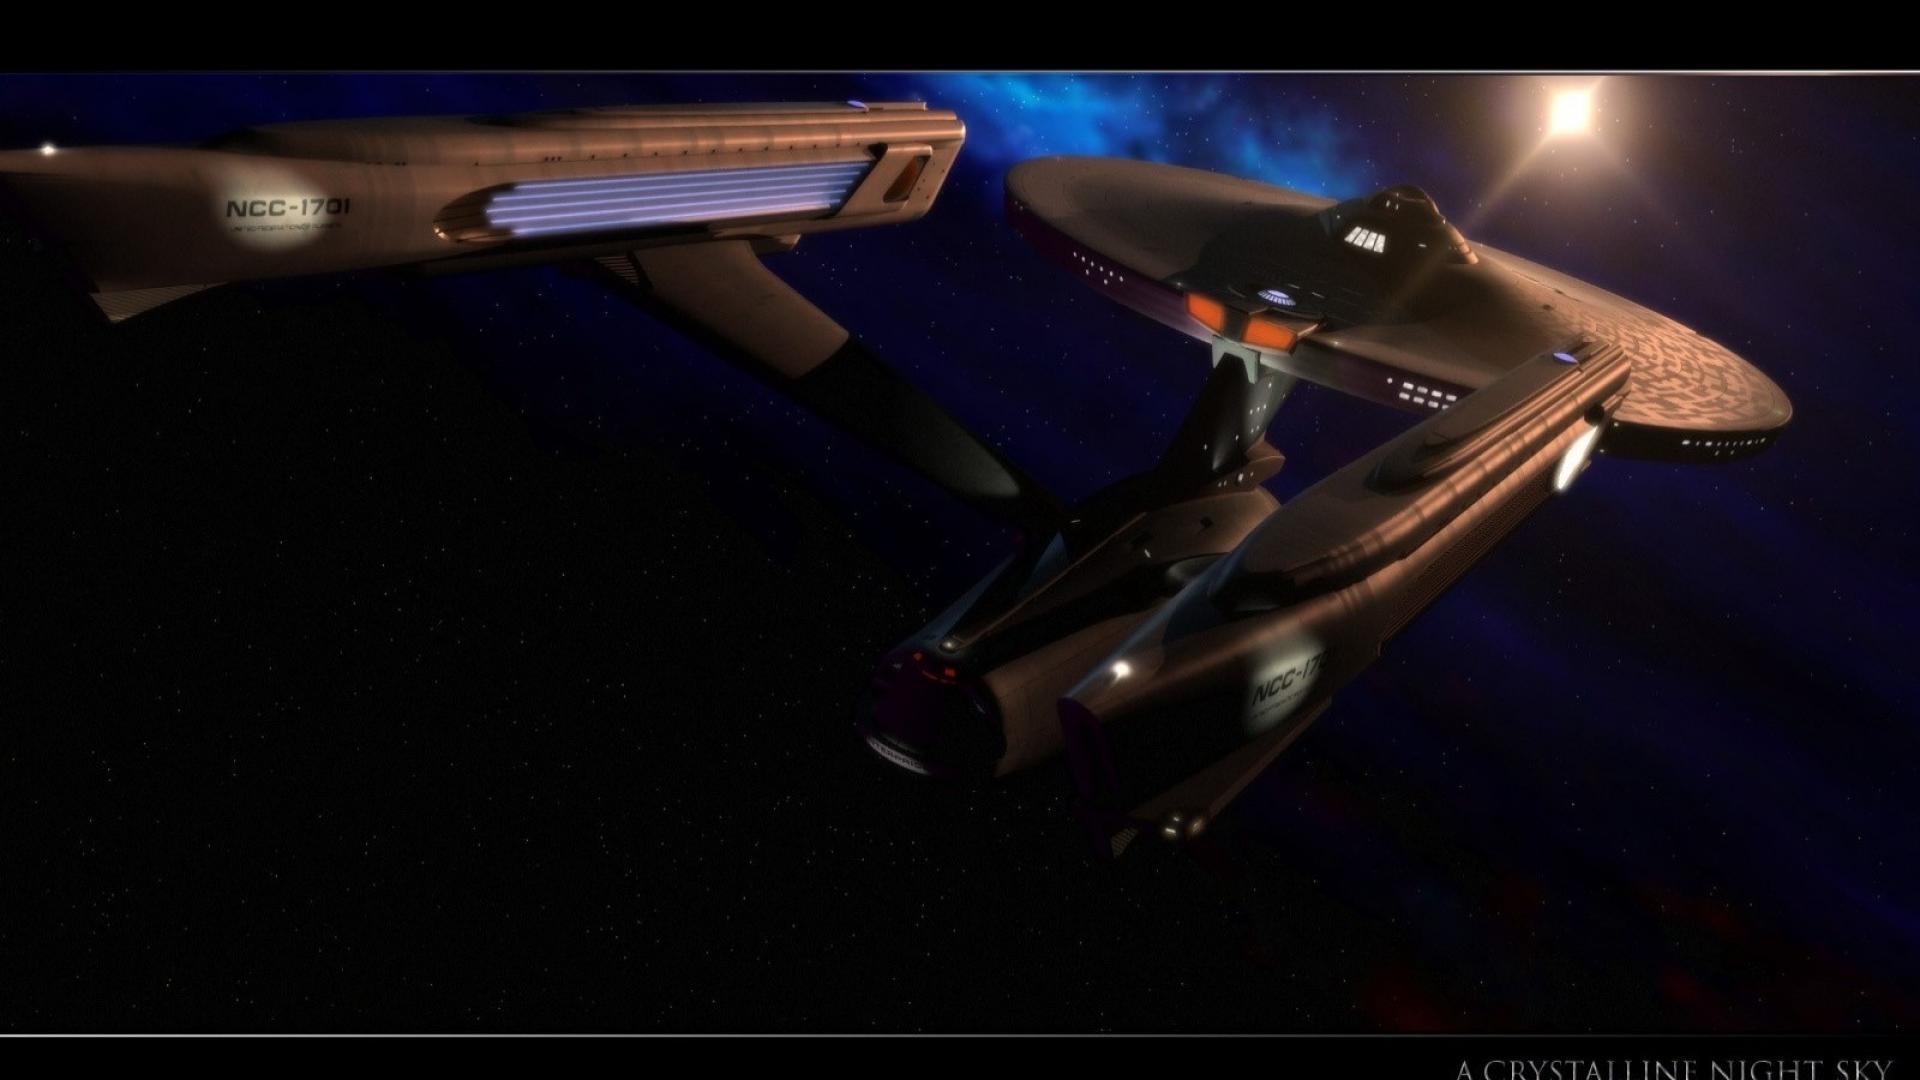 Star trek uss enterprise spaceships vehicles wallpaper HQ WALLPAPER 1920x1080